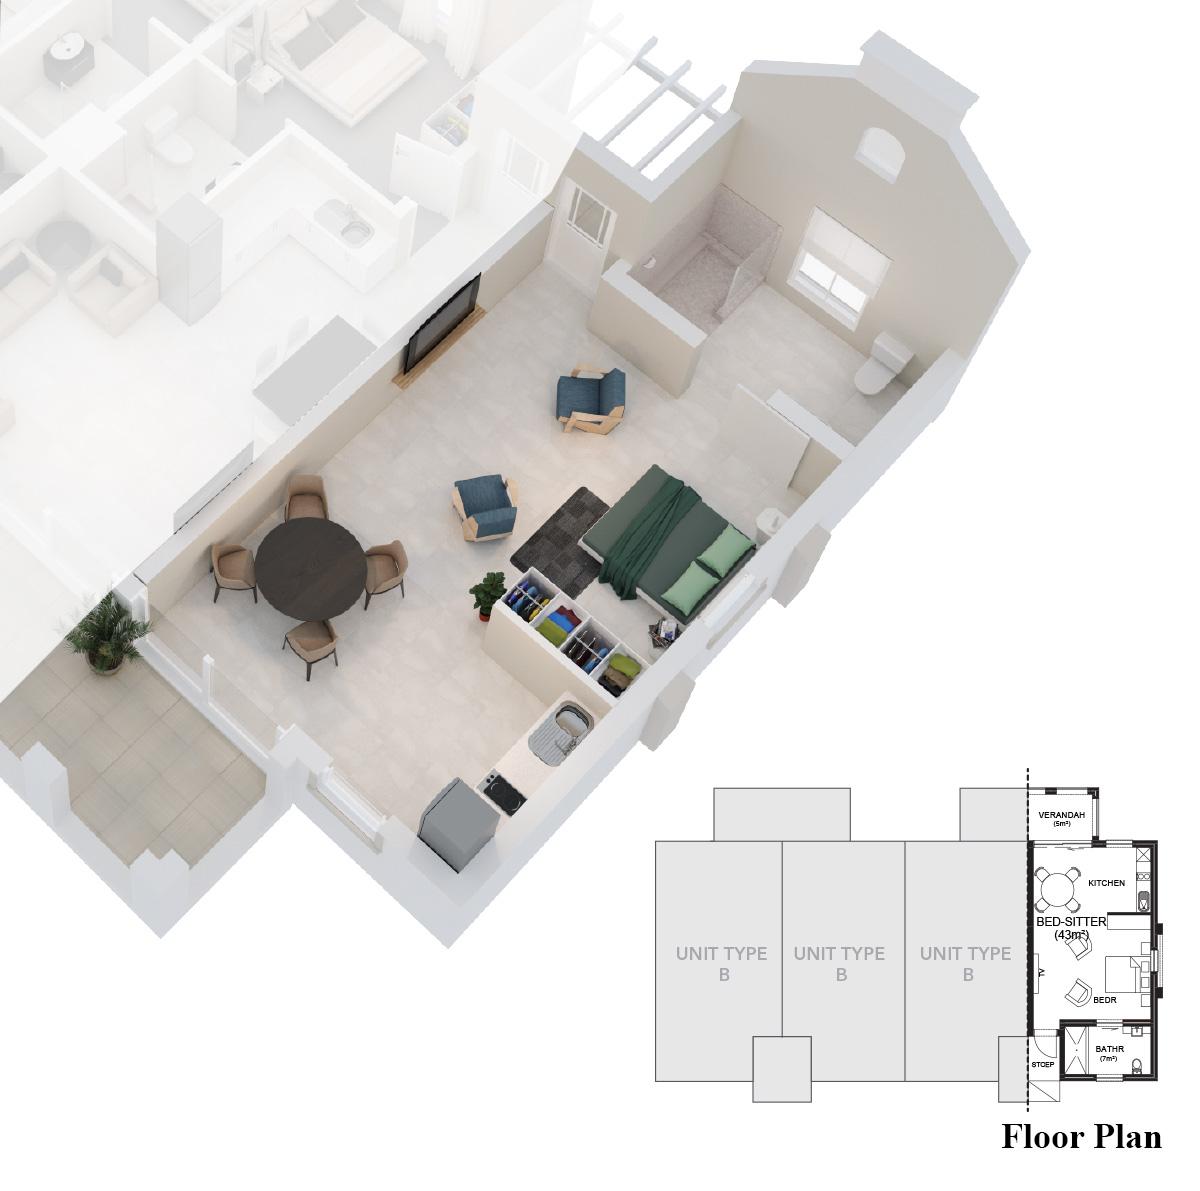 zevenwacht_lifestyle_estate_retirement_apartments_type-a_1200x1191